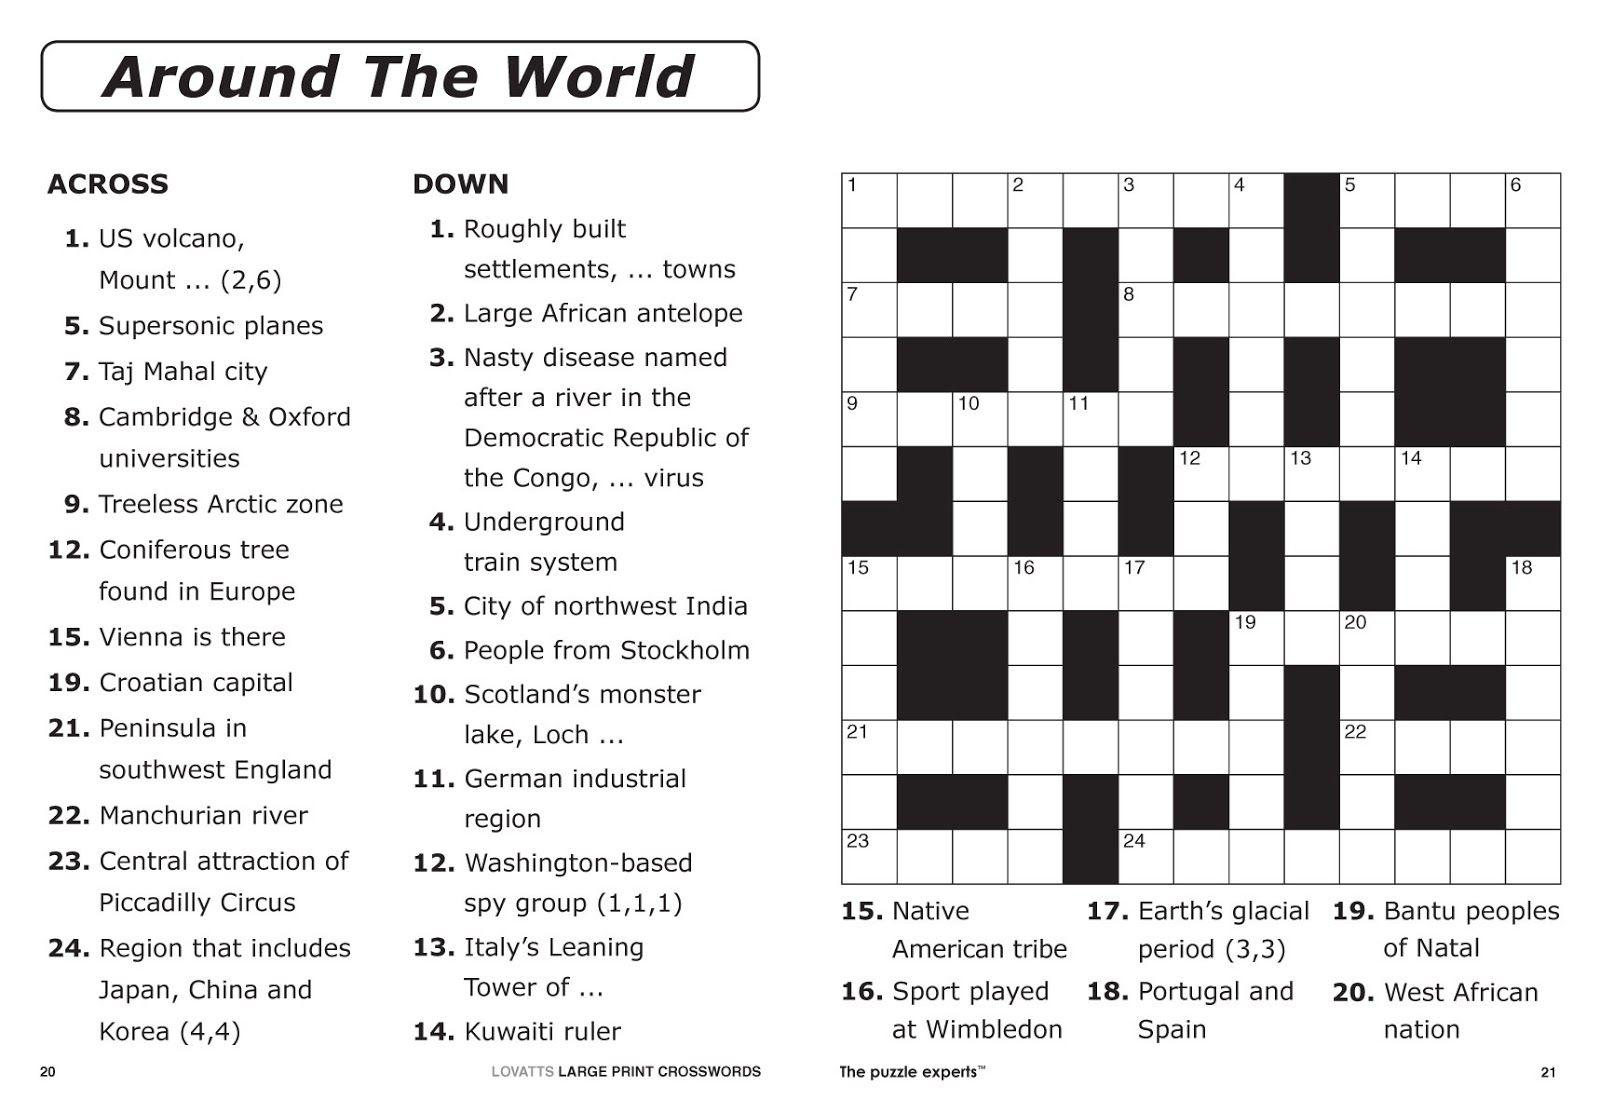 Free Printable Large Print Crossword Puzzles | M3U8 - Printable Crosswords For 9 Year Olds